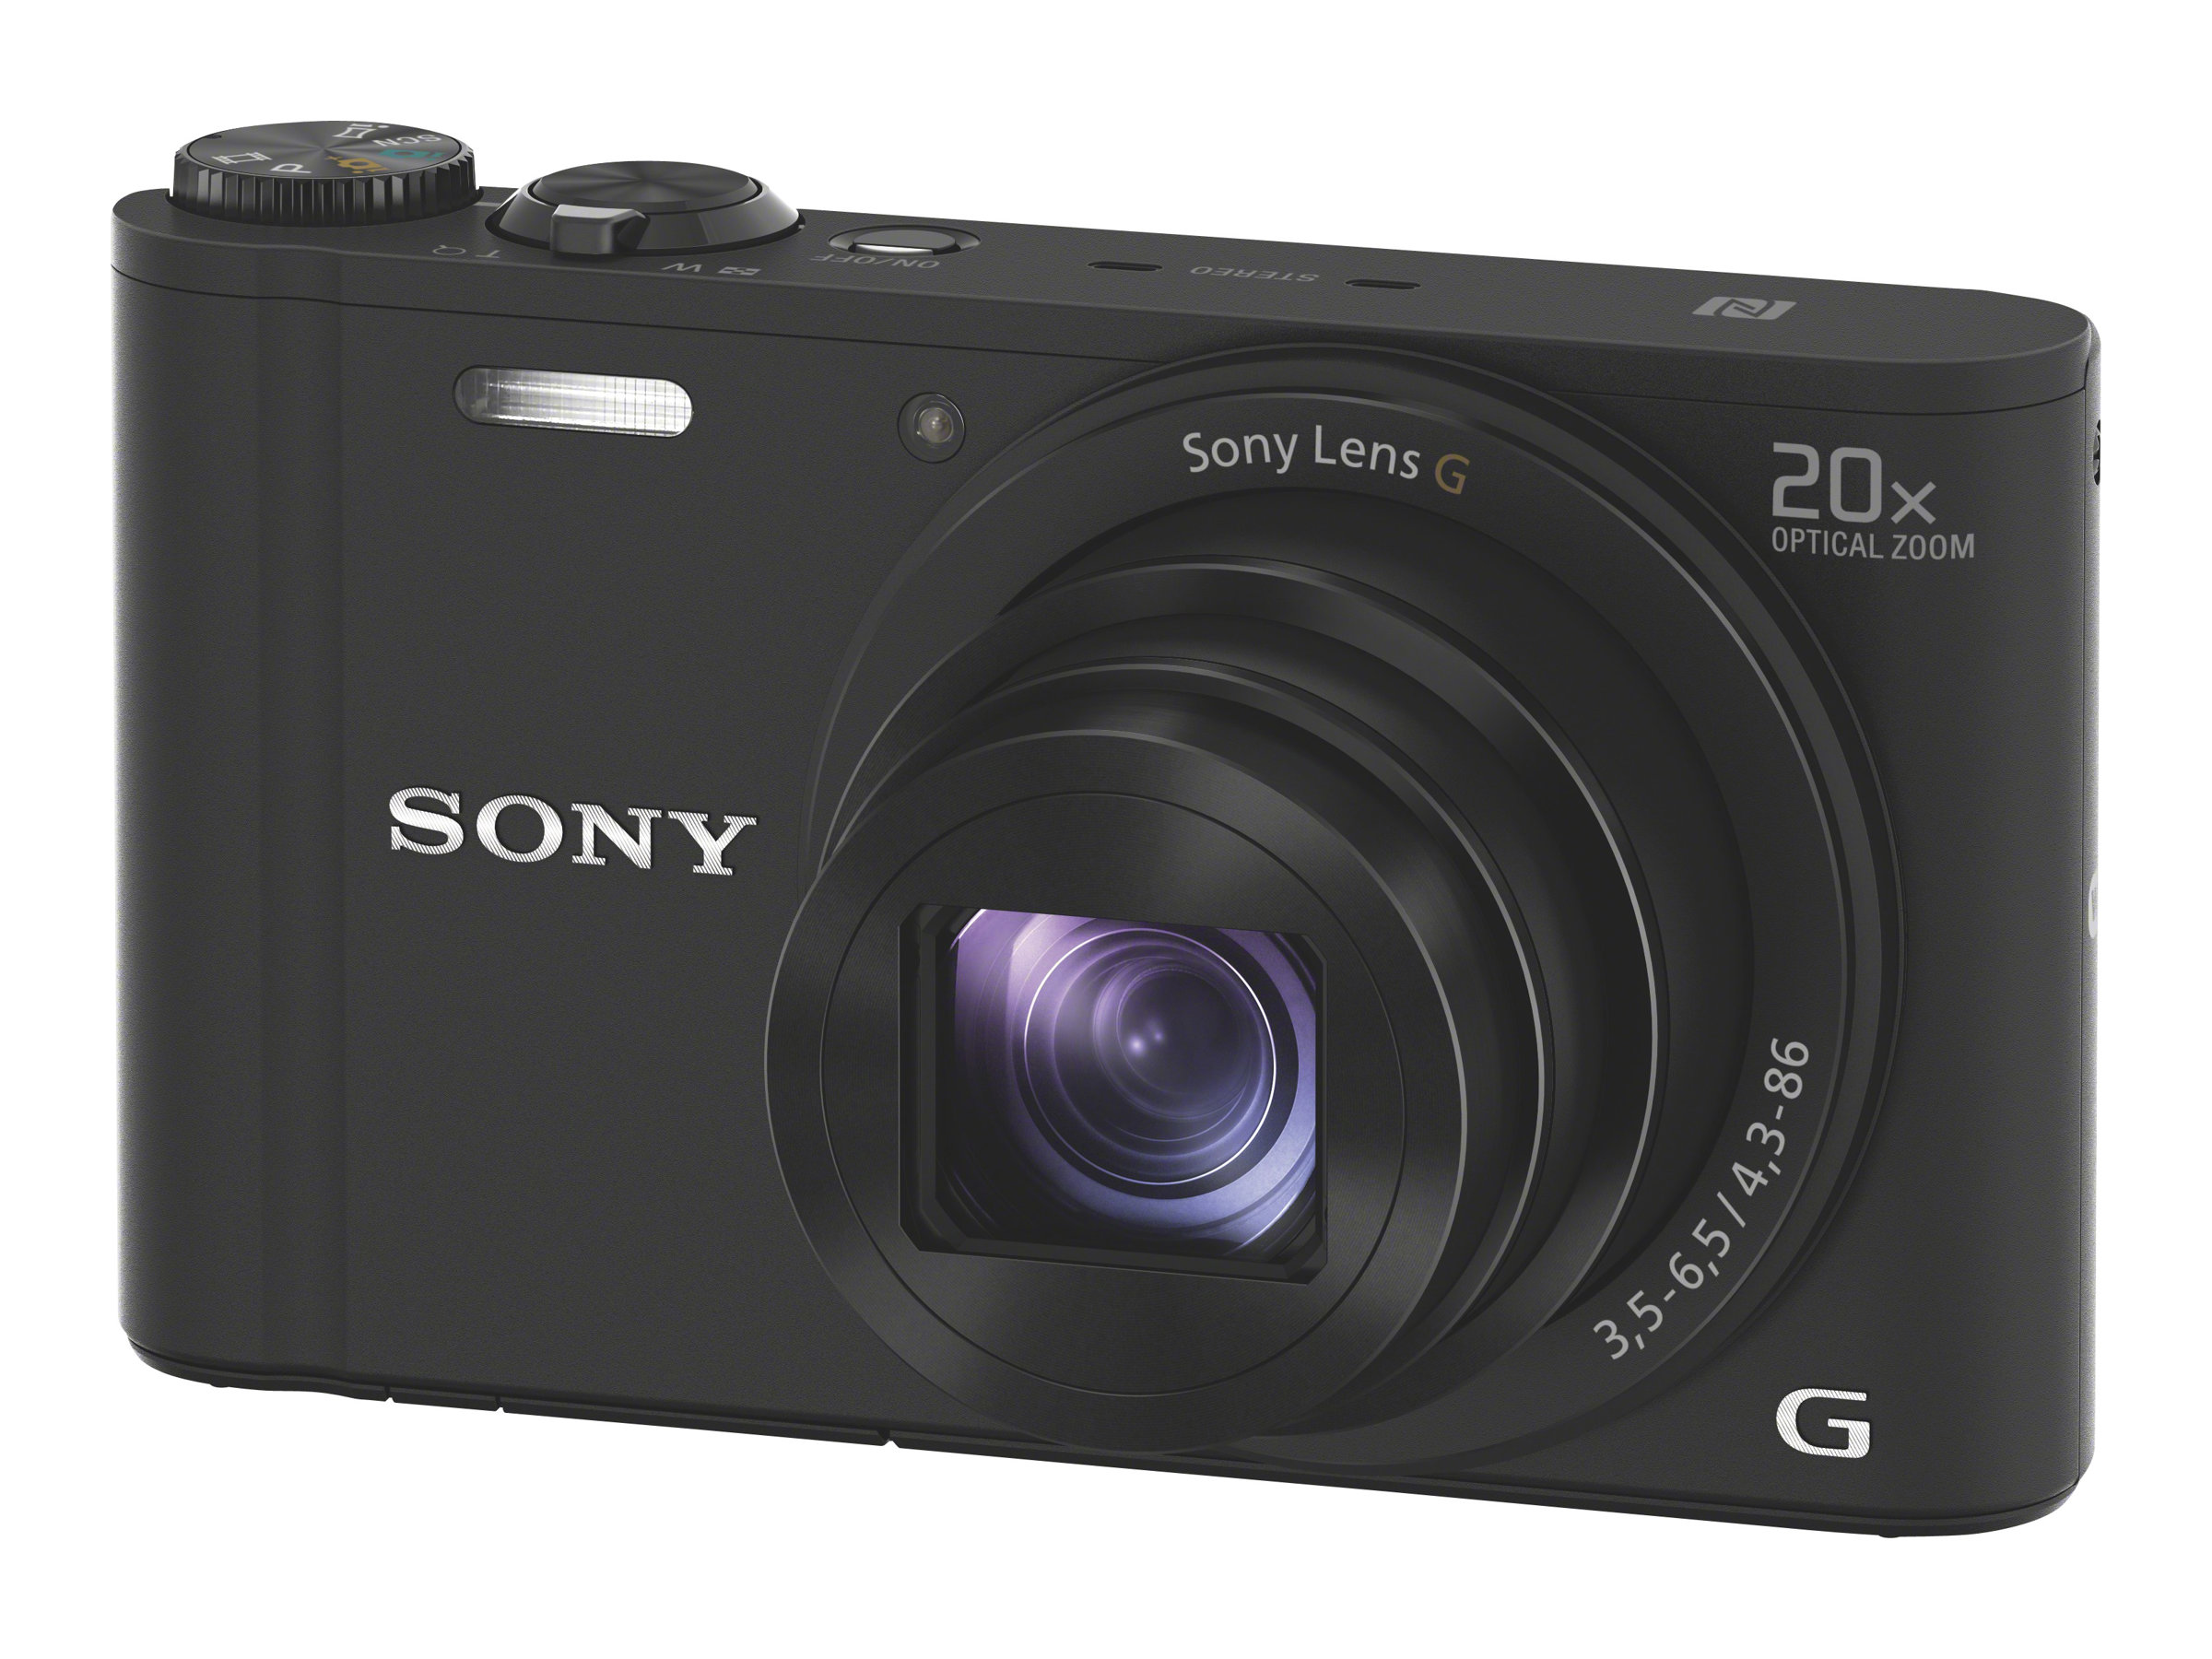 Sony Cyber-shot DSC-WX350 - Digitalkamera - Kompaktkamera - 18.2 MPix - 20x optischer Zoom - Wi-Fi, NFC